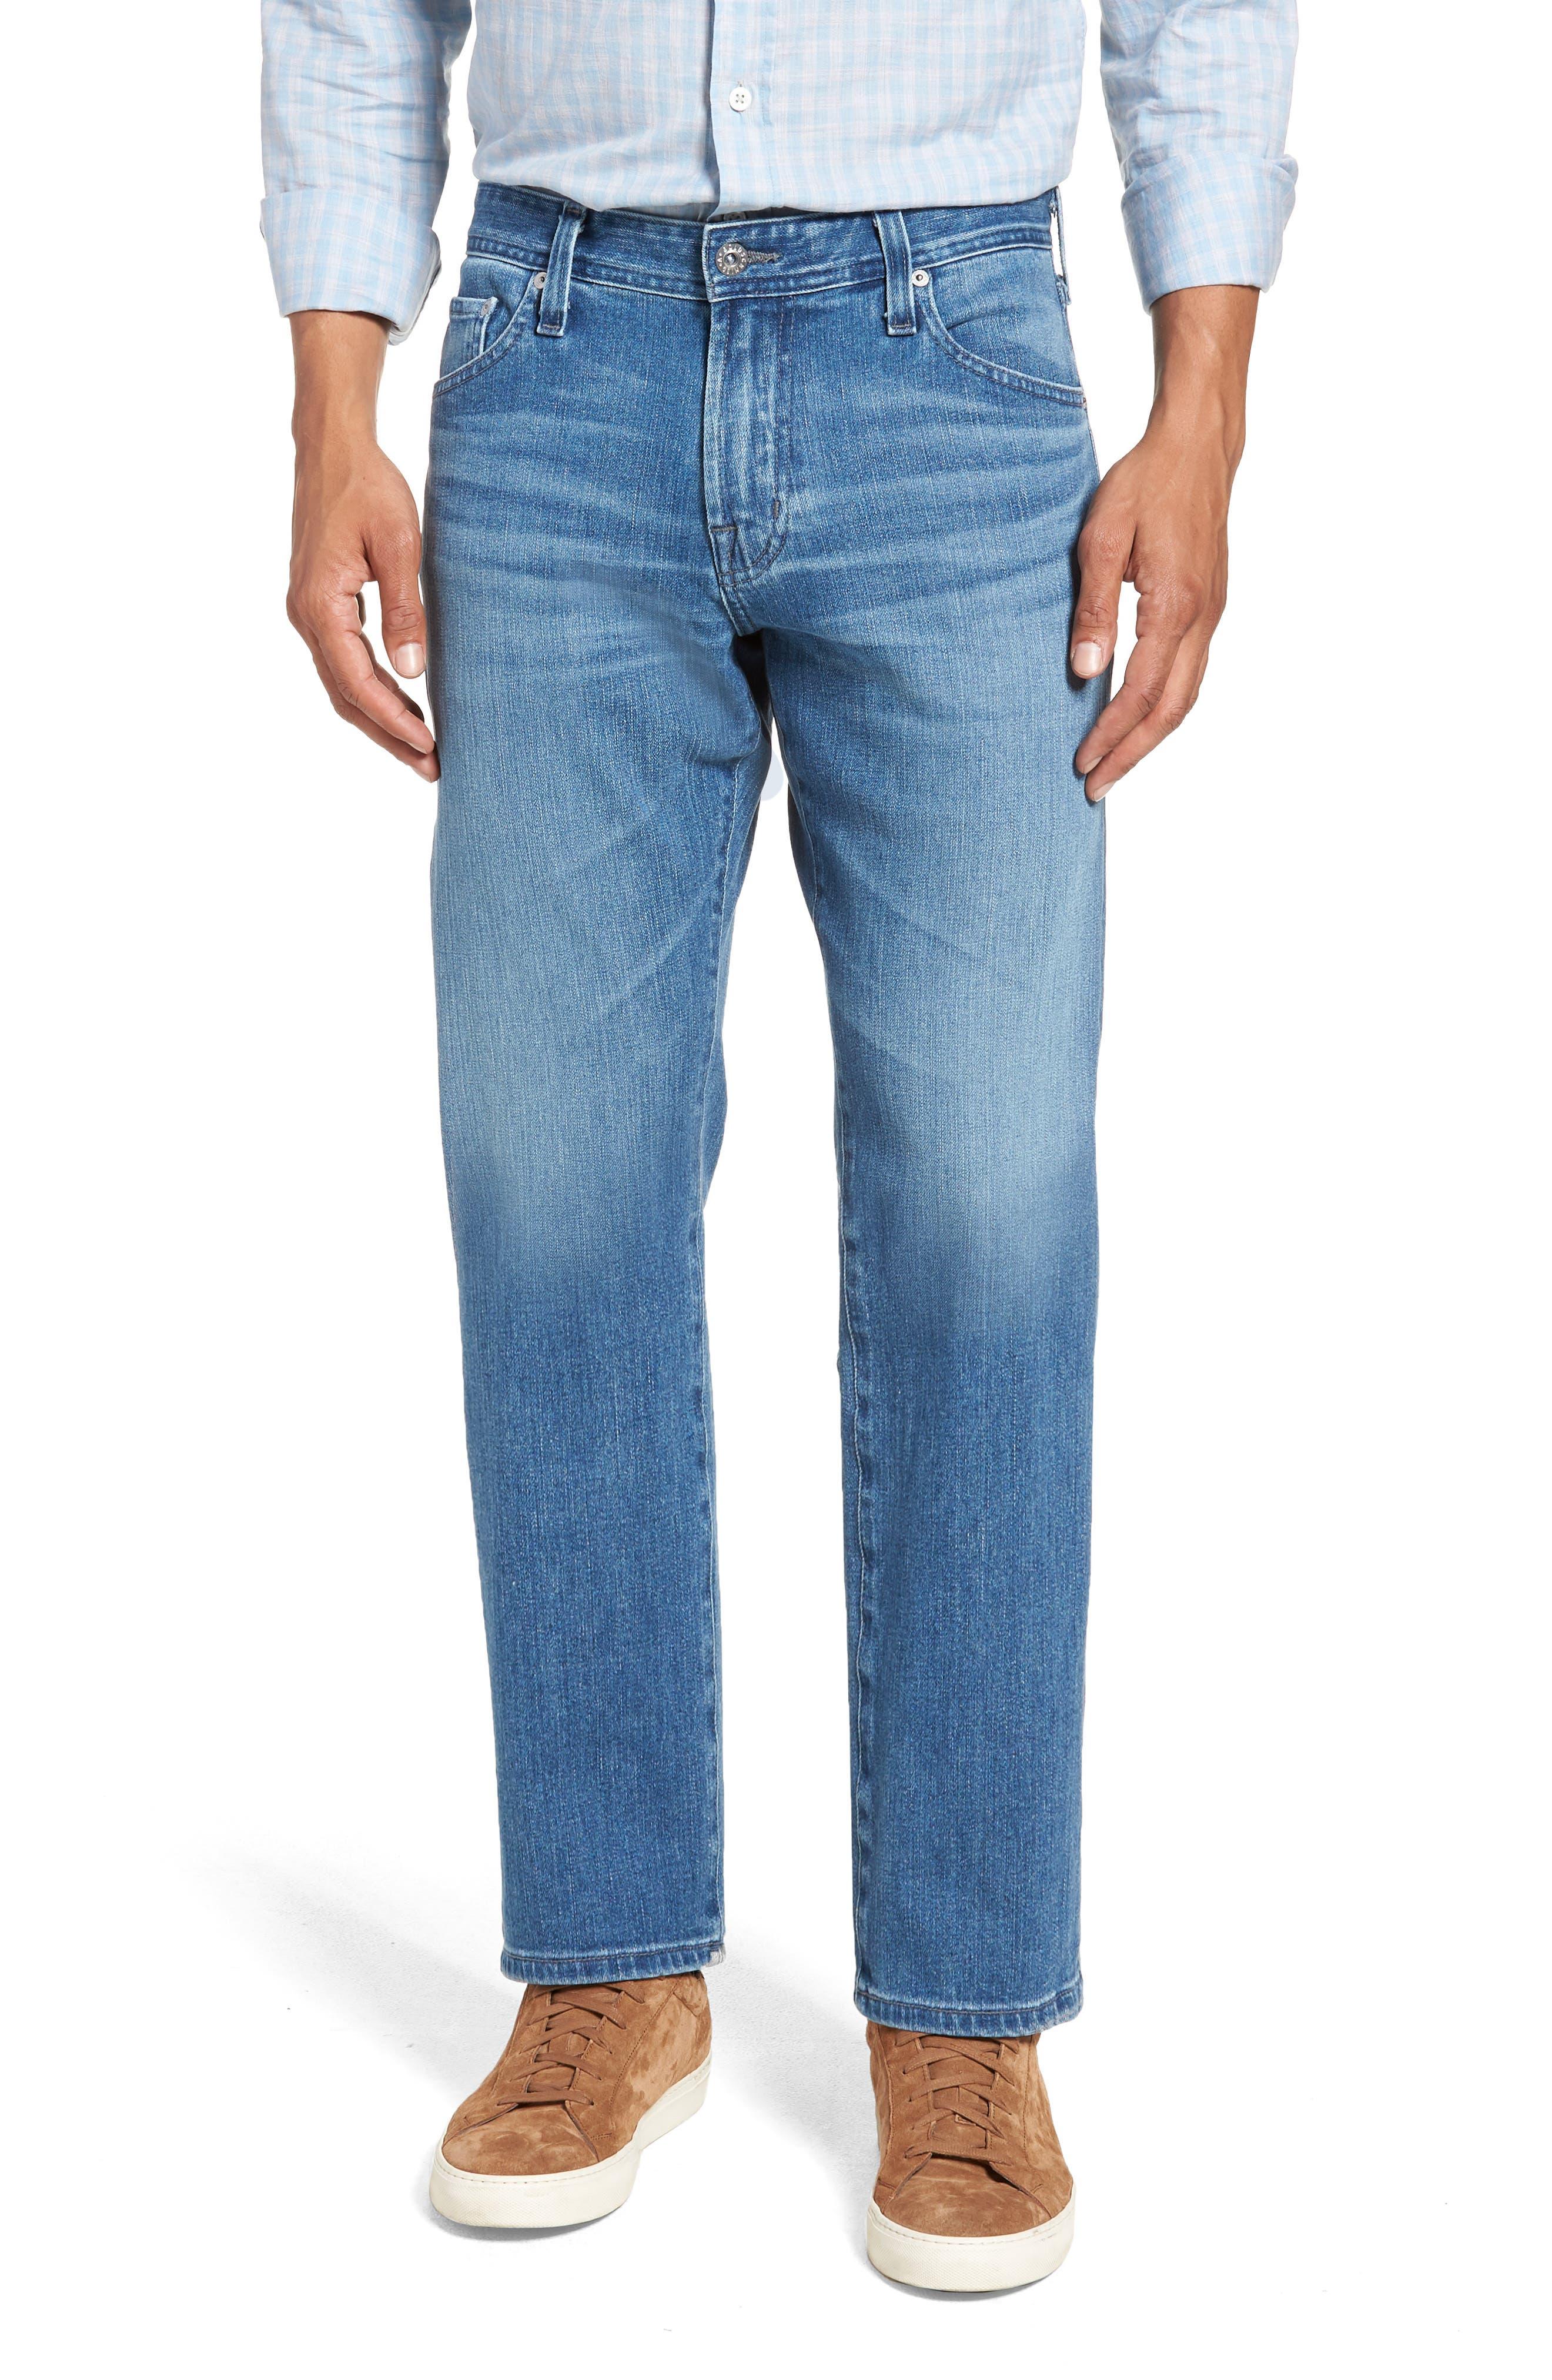 Graduate Slim Straight Leg Jeans,                             Main thumbnail 1, color,                             DEMOLITION